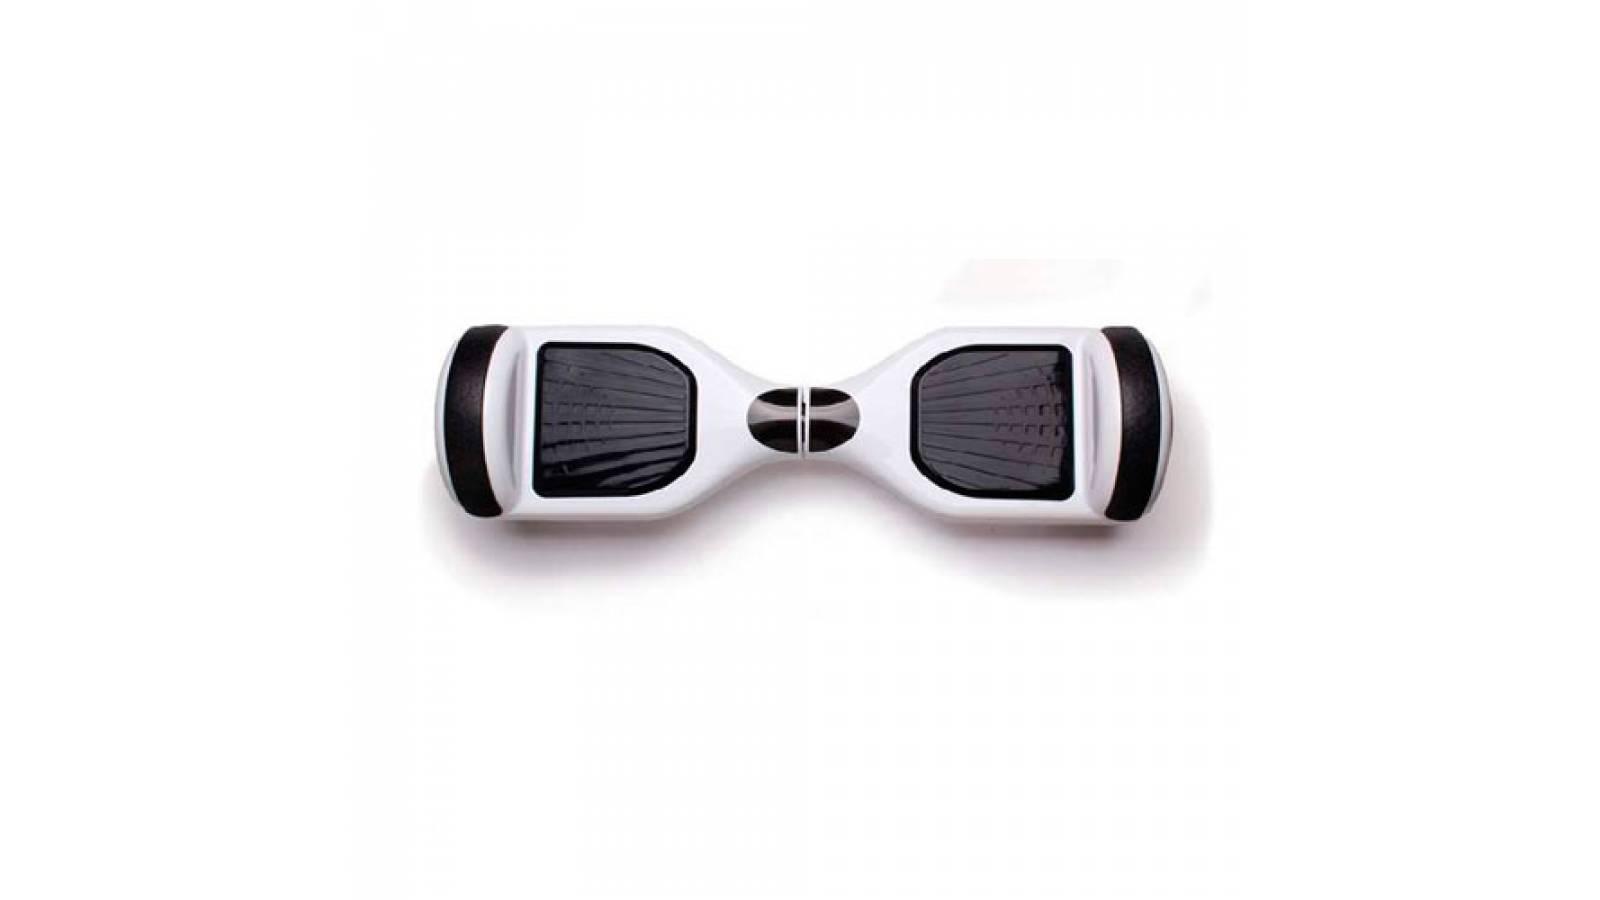 Patineta de Equilibrio con Bluetooth, parlantes, luces